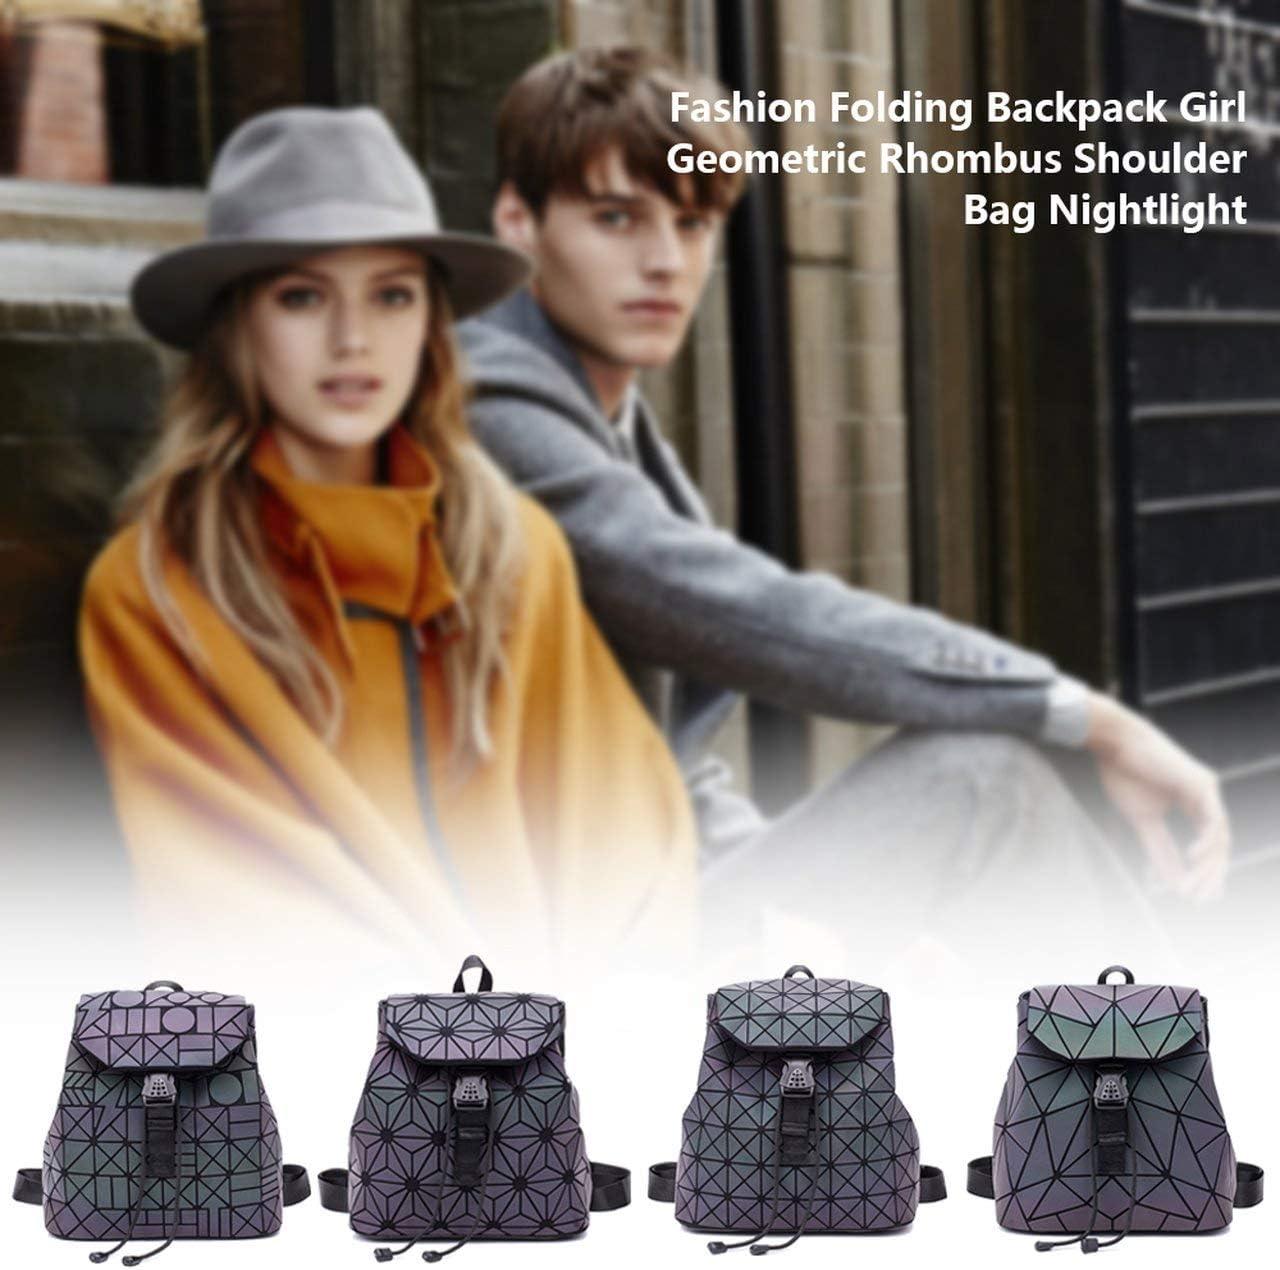 Bag Female Fashion Folding Backpack Female Geometric Rhombic Backpack Magic Color Luminous Gradient Color Backpack